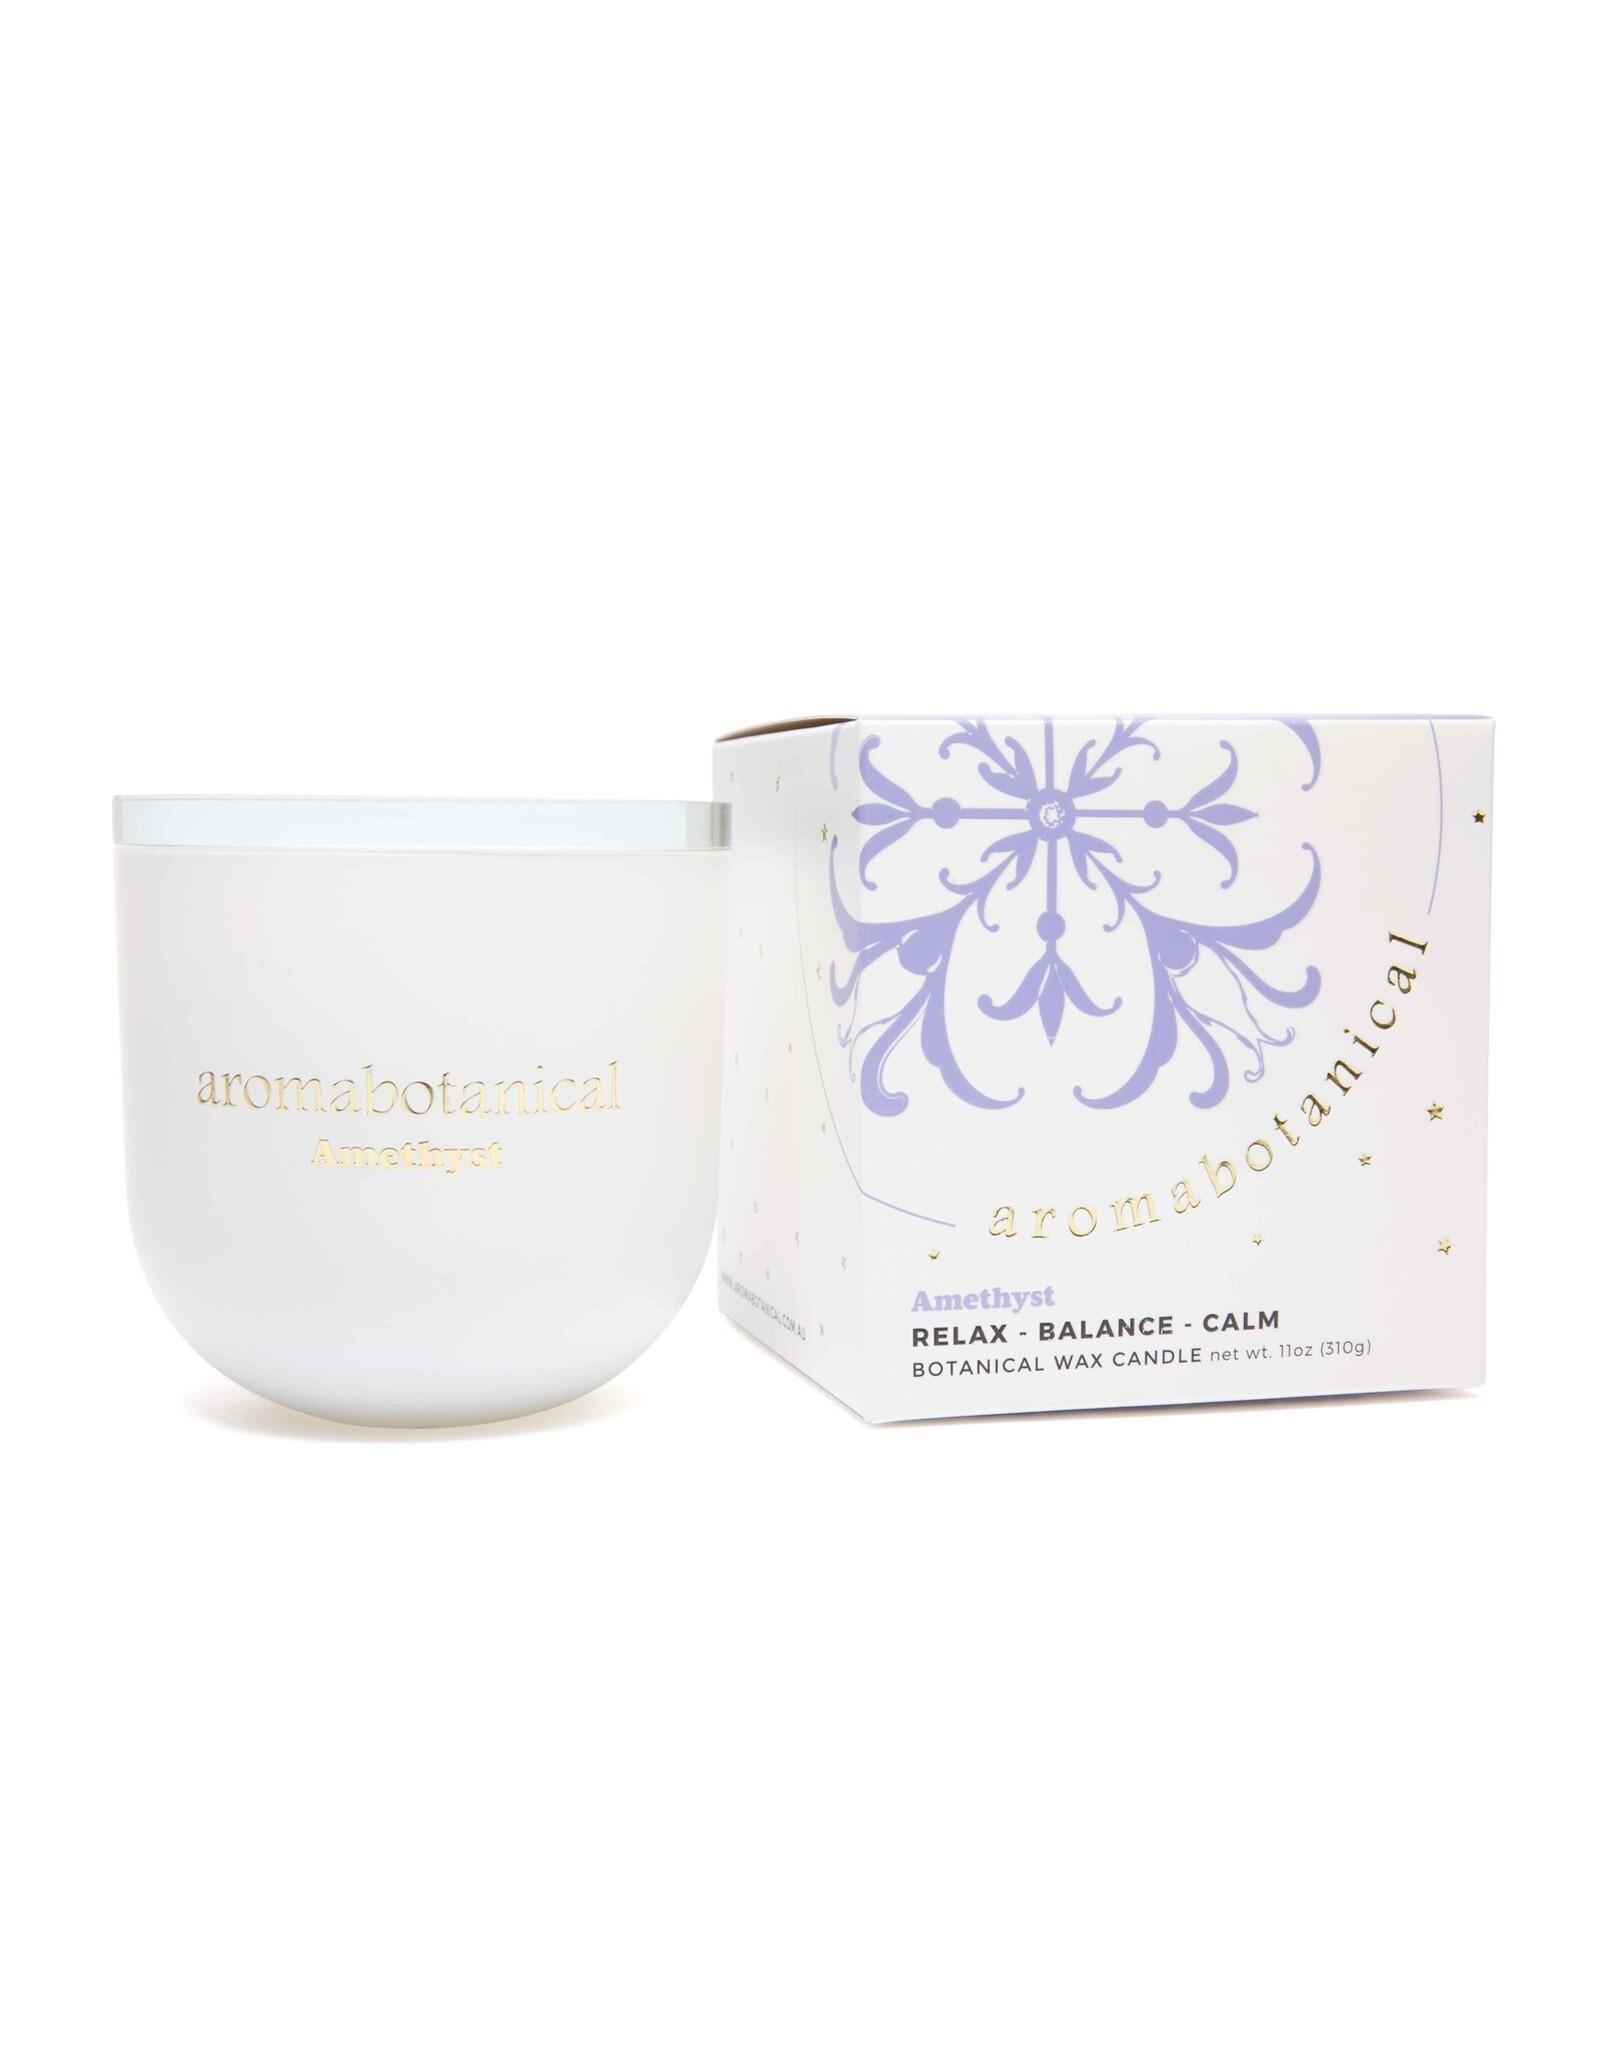 AromaBotanicals Crystal Candle 310g